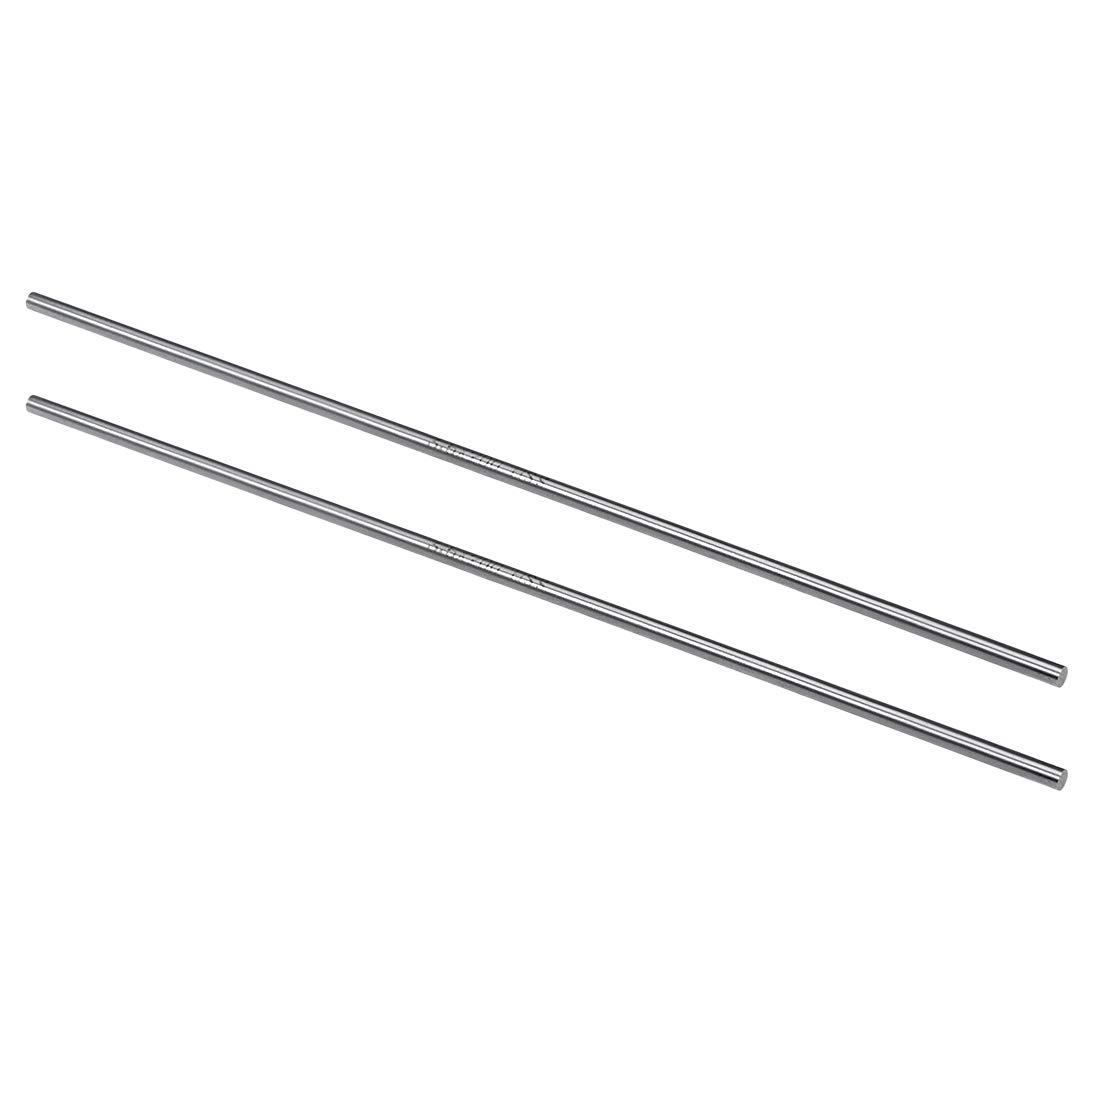 sourcing map HSS Lathe Round Rod Solid Shaft Bar 2mm Dia 200mm Length 5Pcs